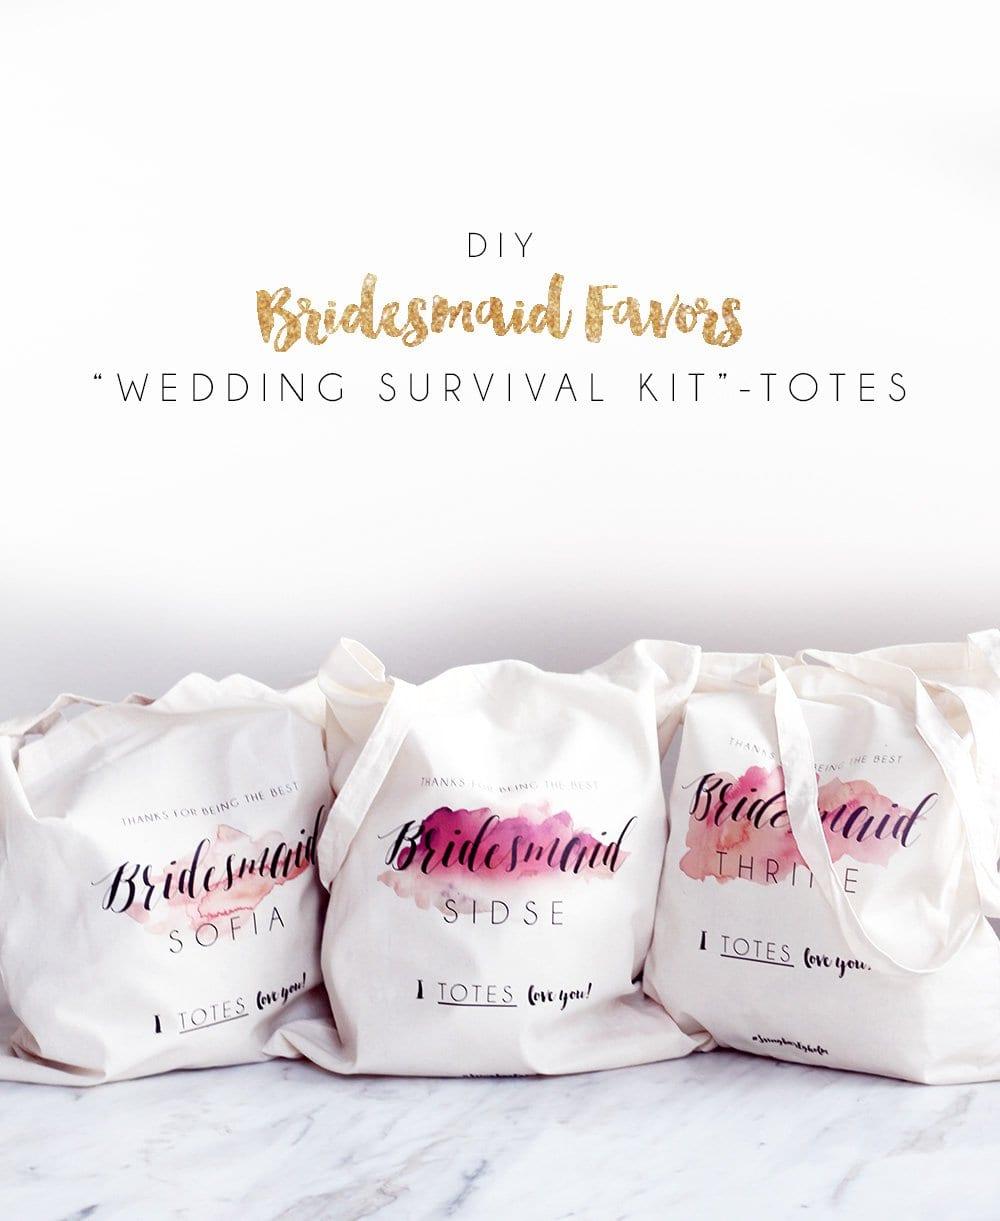 diy-bridesmaid-favors0-1